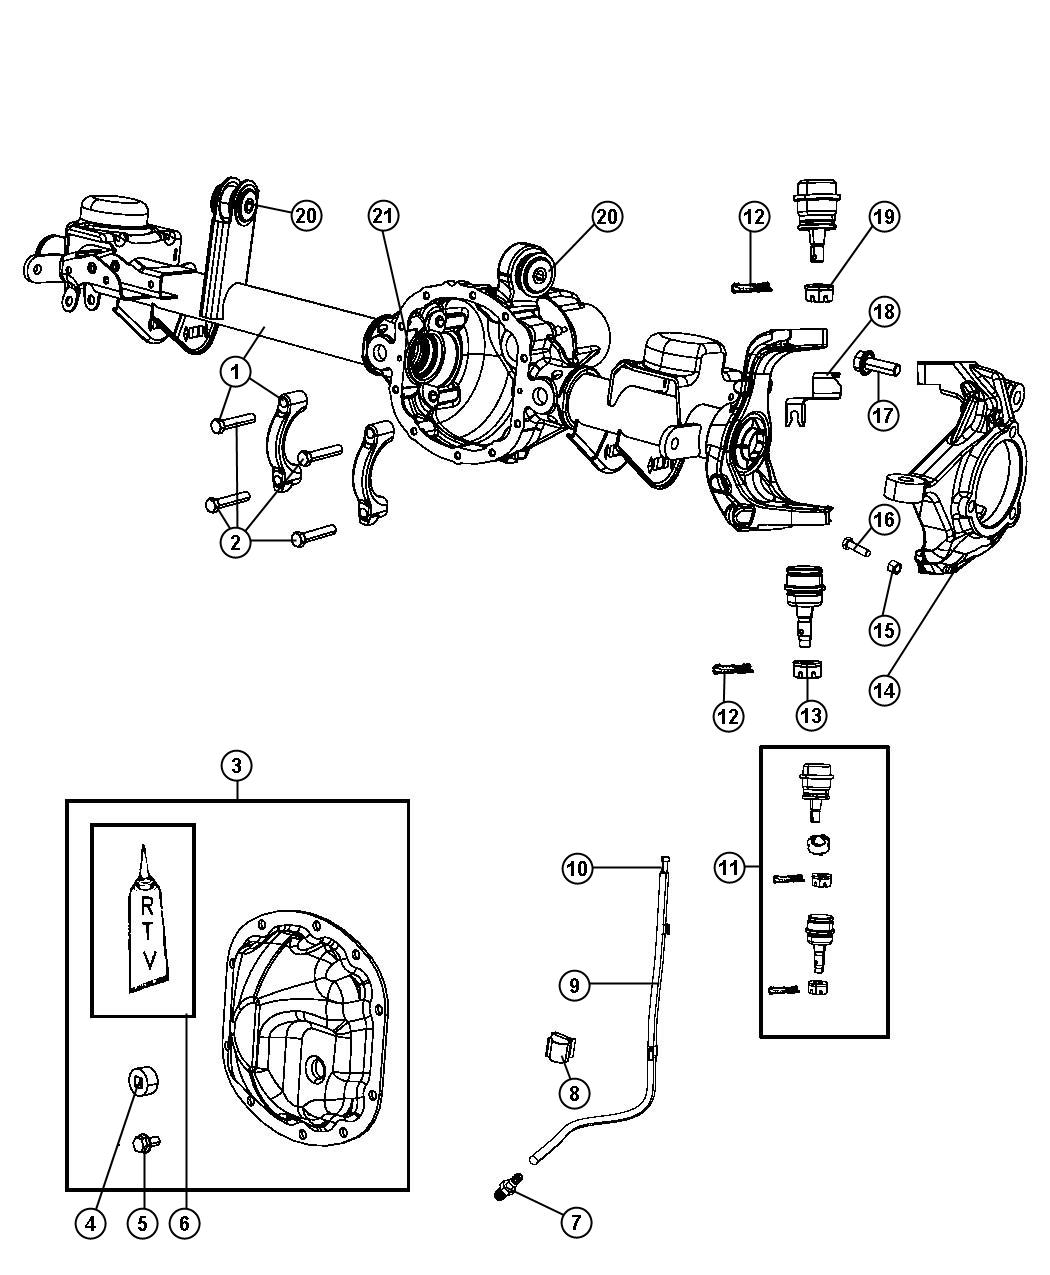 2008 Jeep Wrangler UNLIMITED X 3.8L V6 A/T 4X4 Bushing